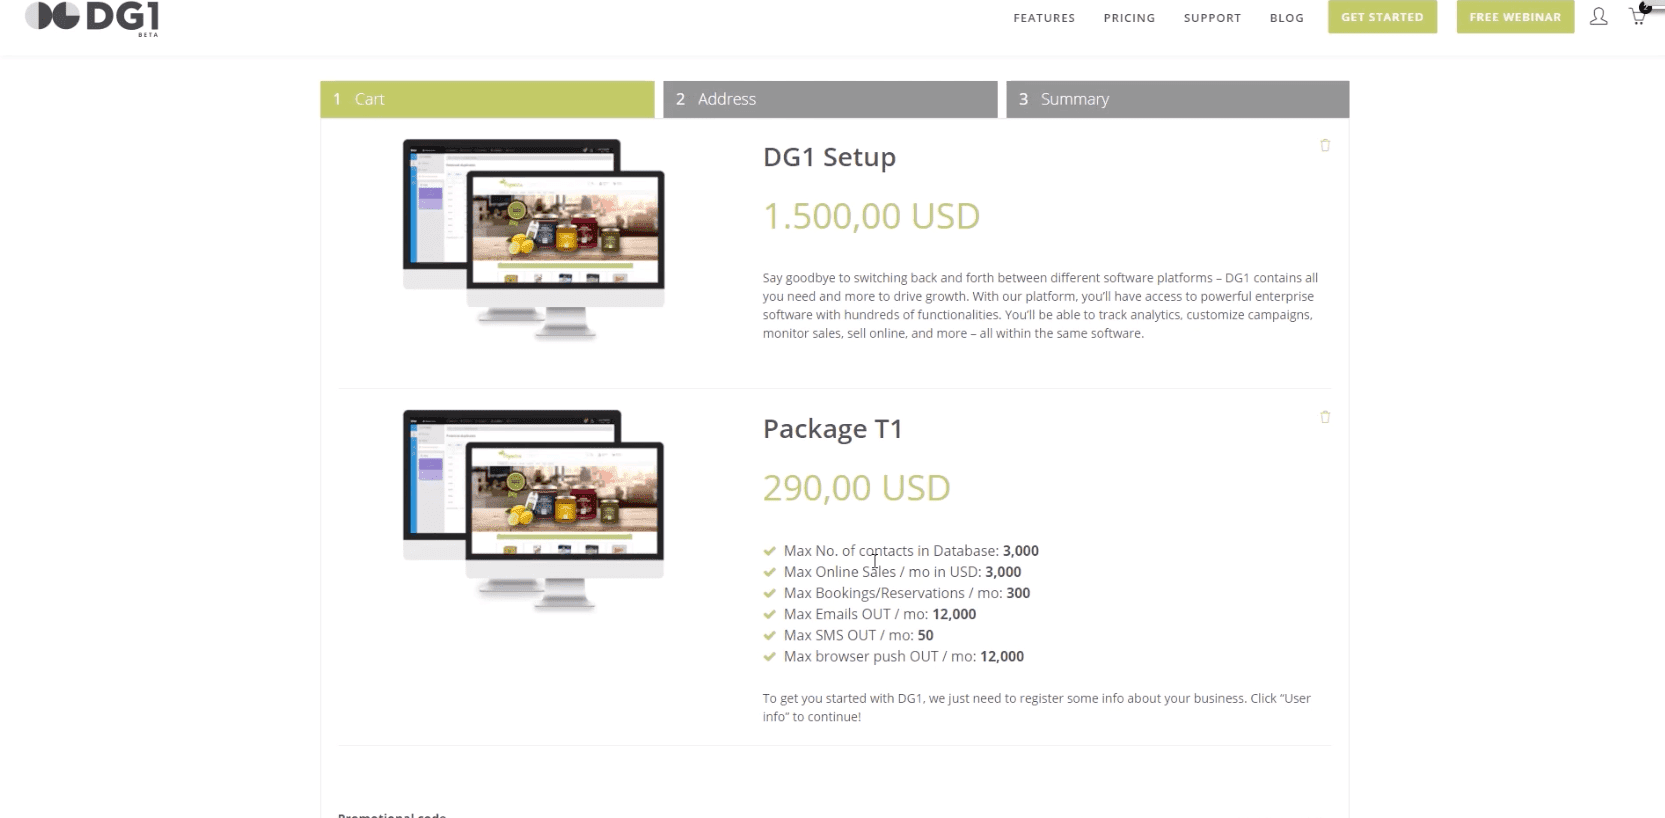 Video -  DG1 - Purchase